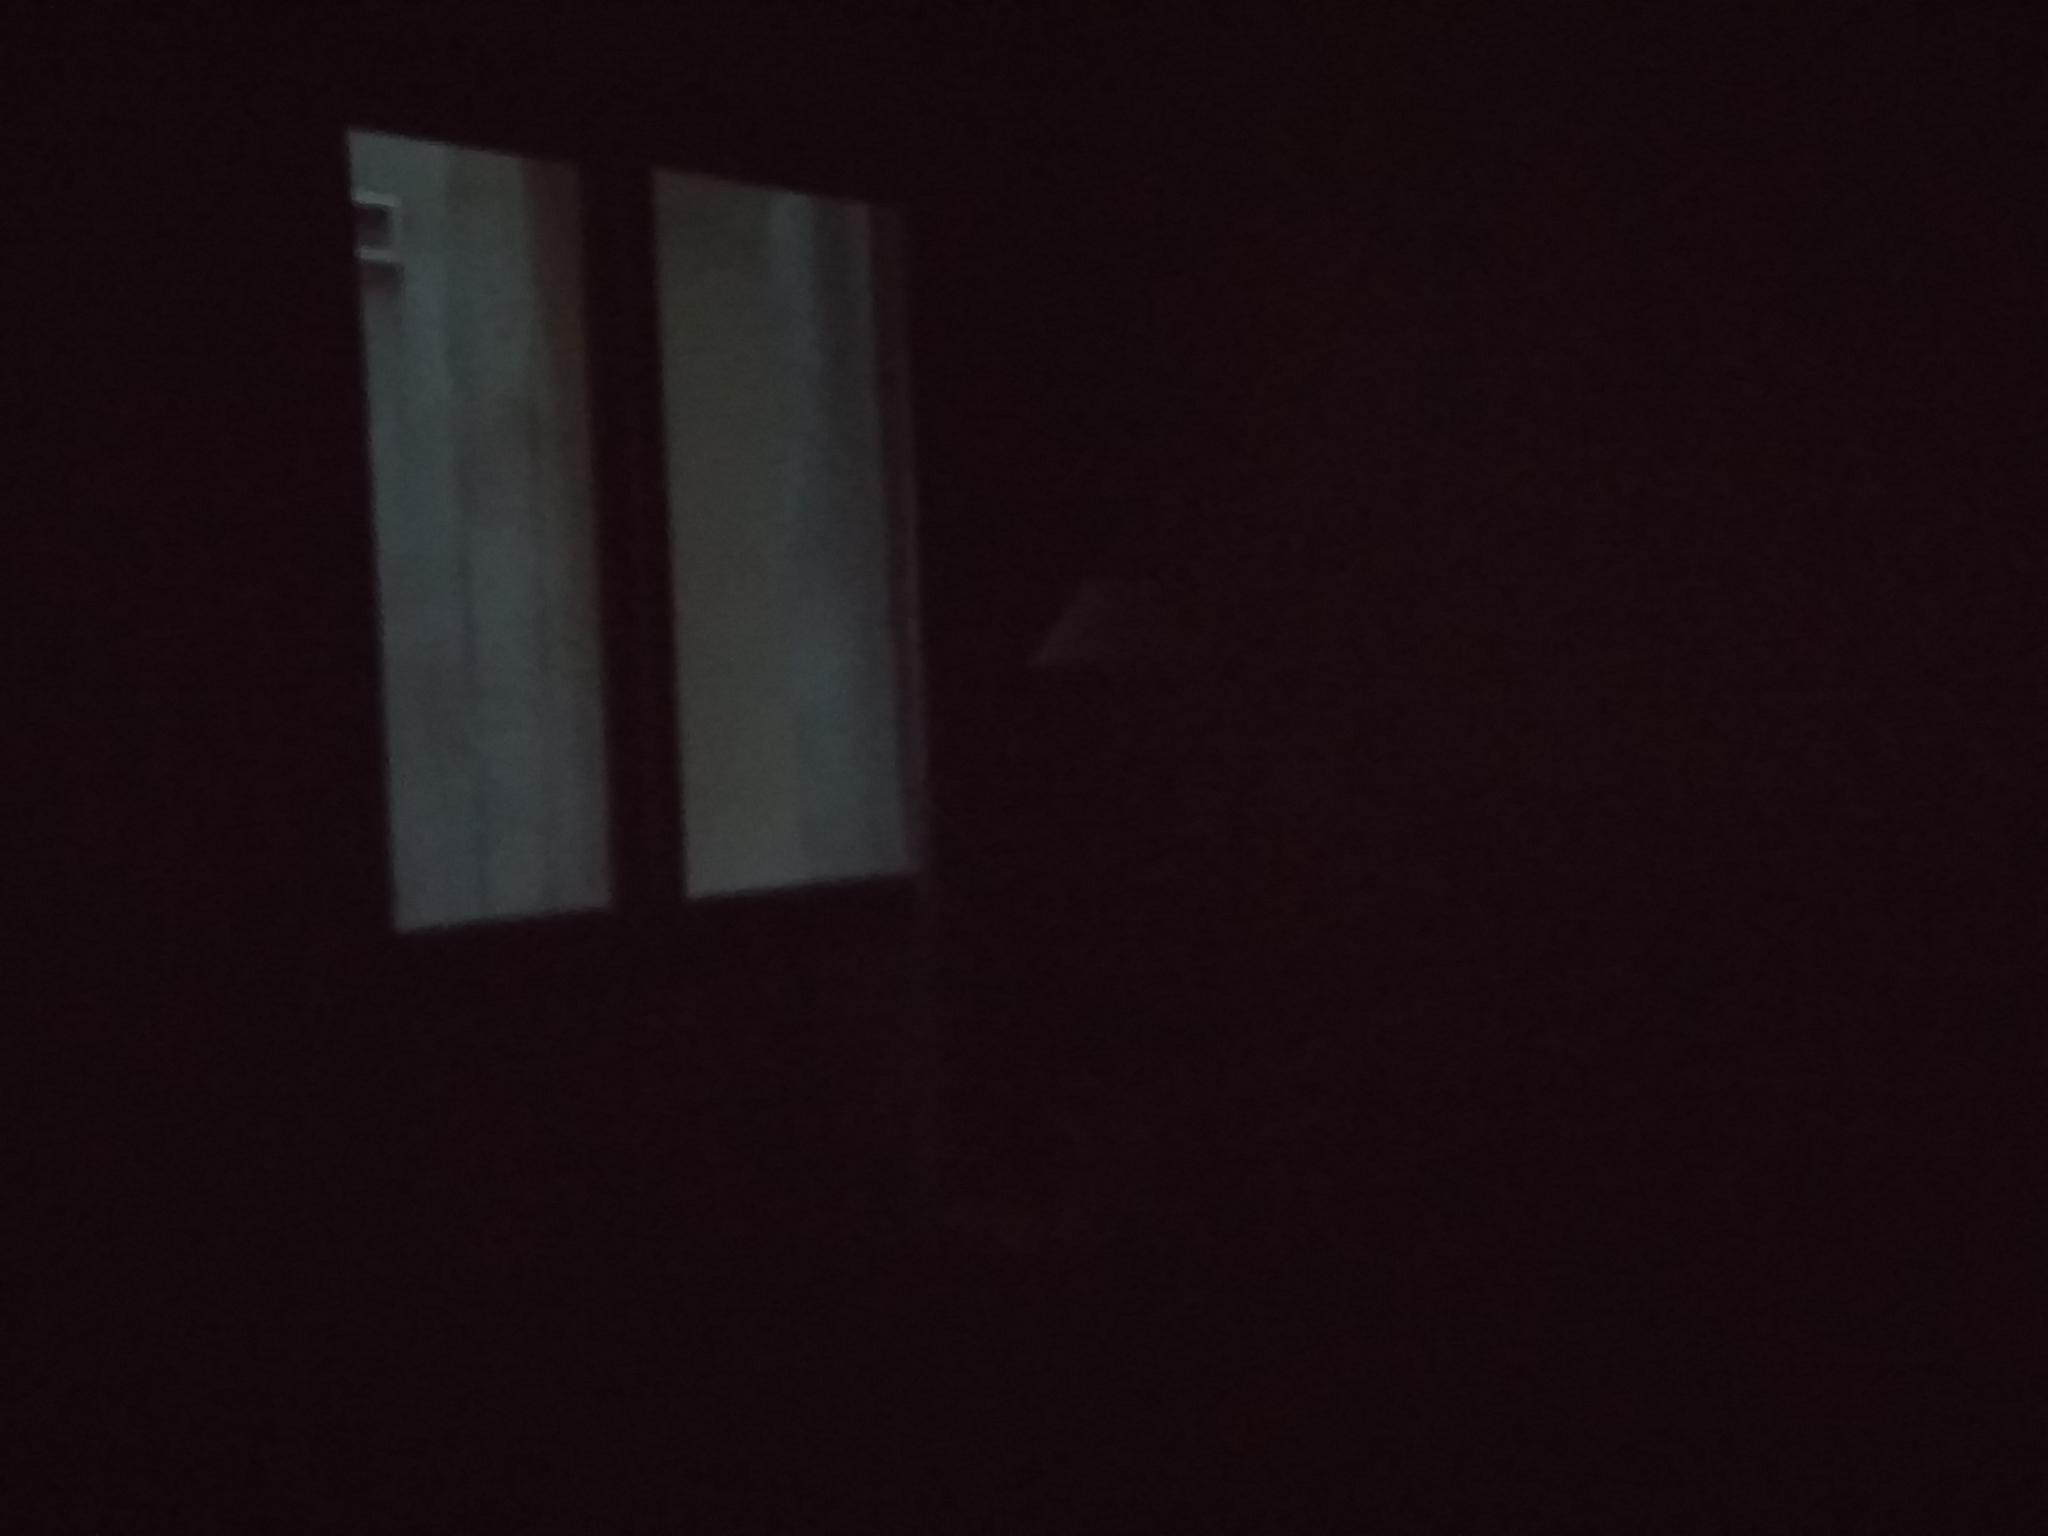 Chambre 203 en plein jour